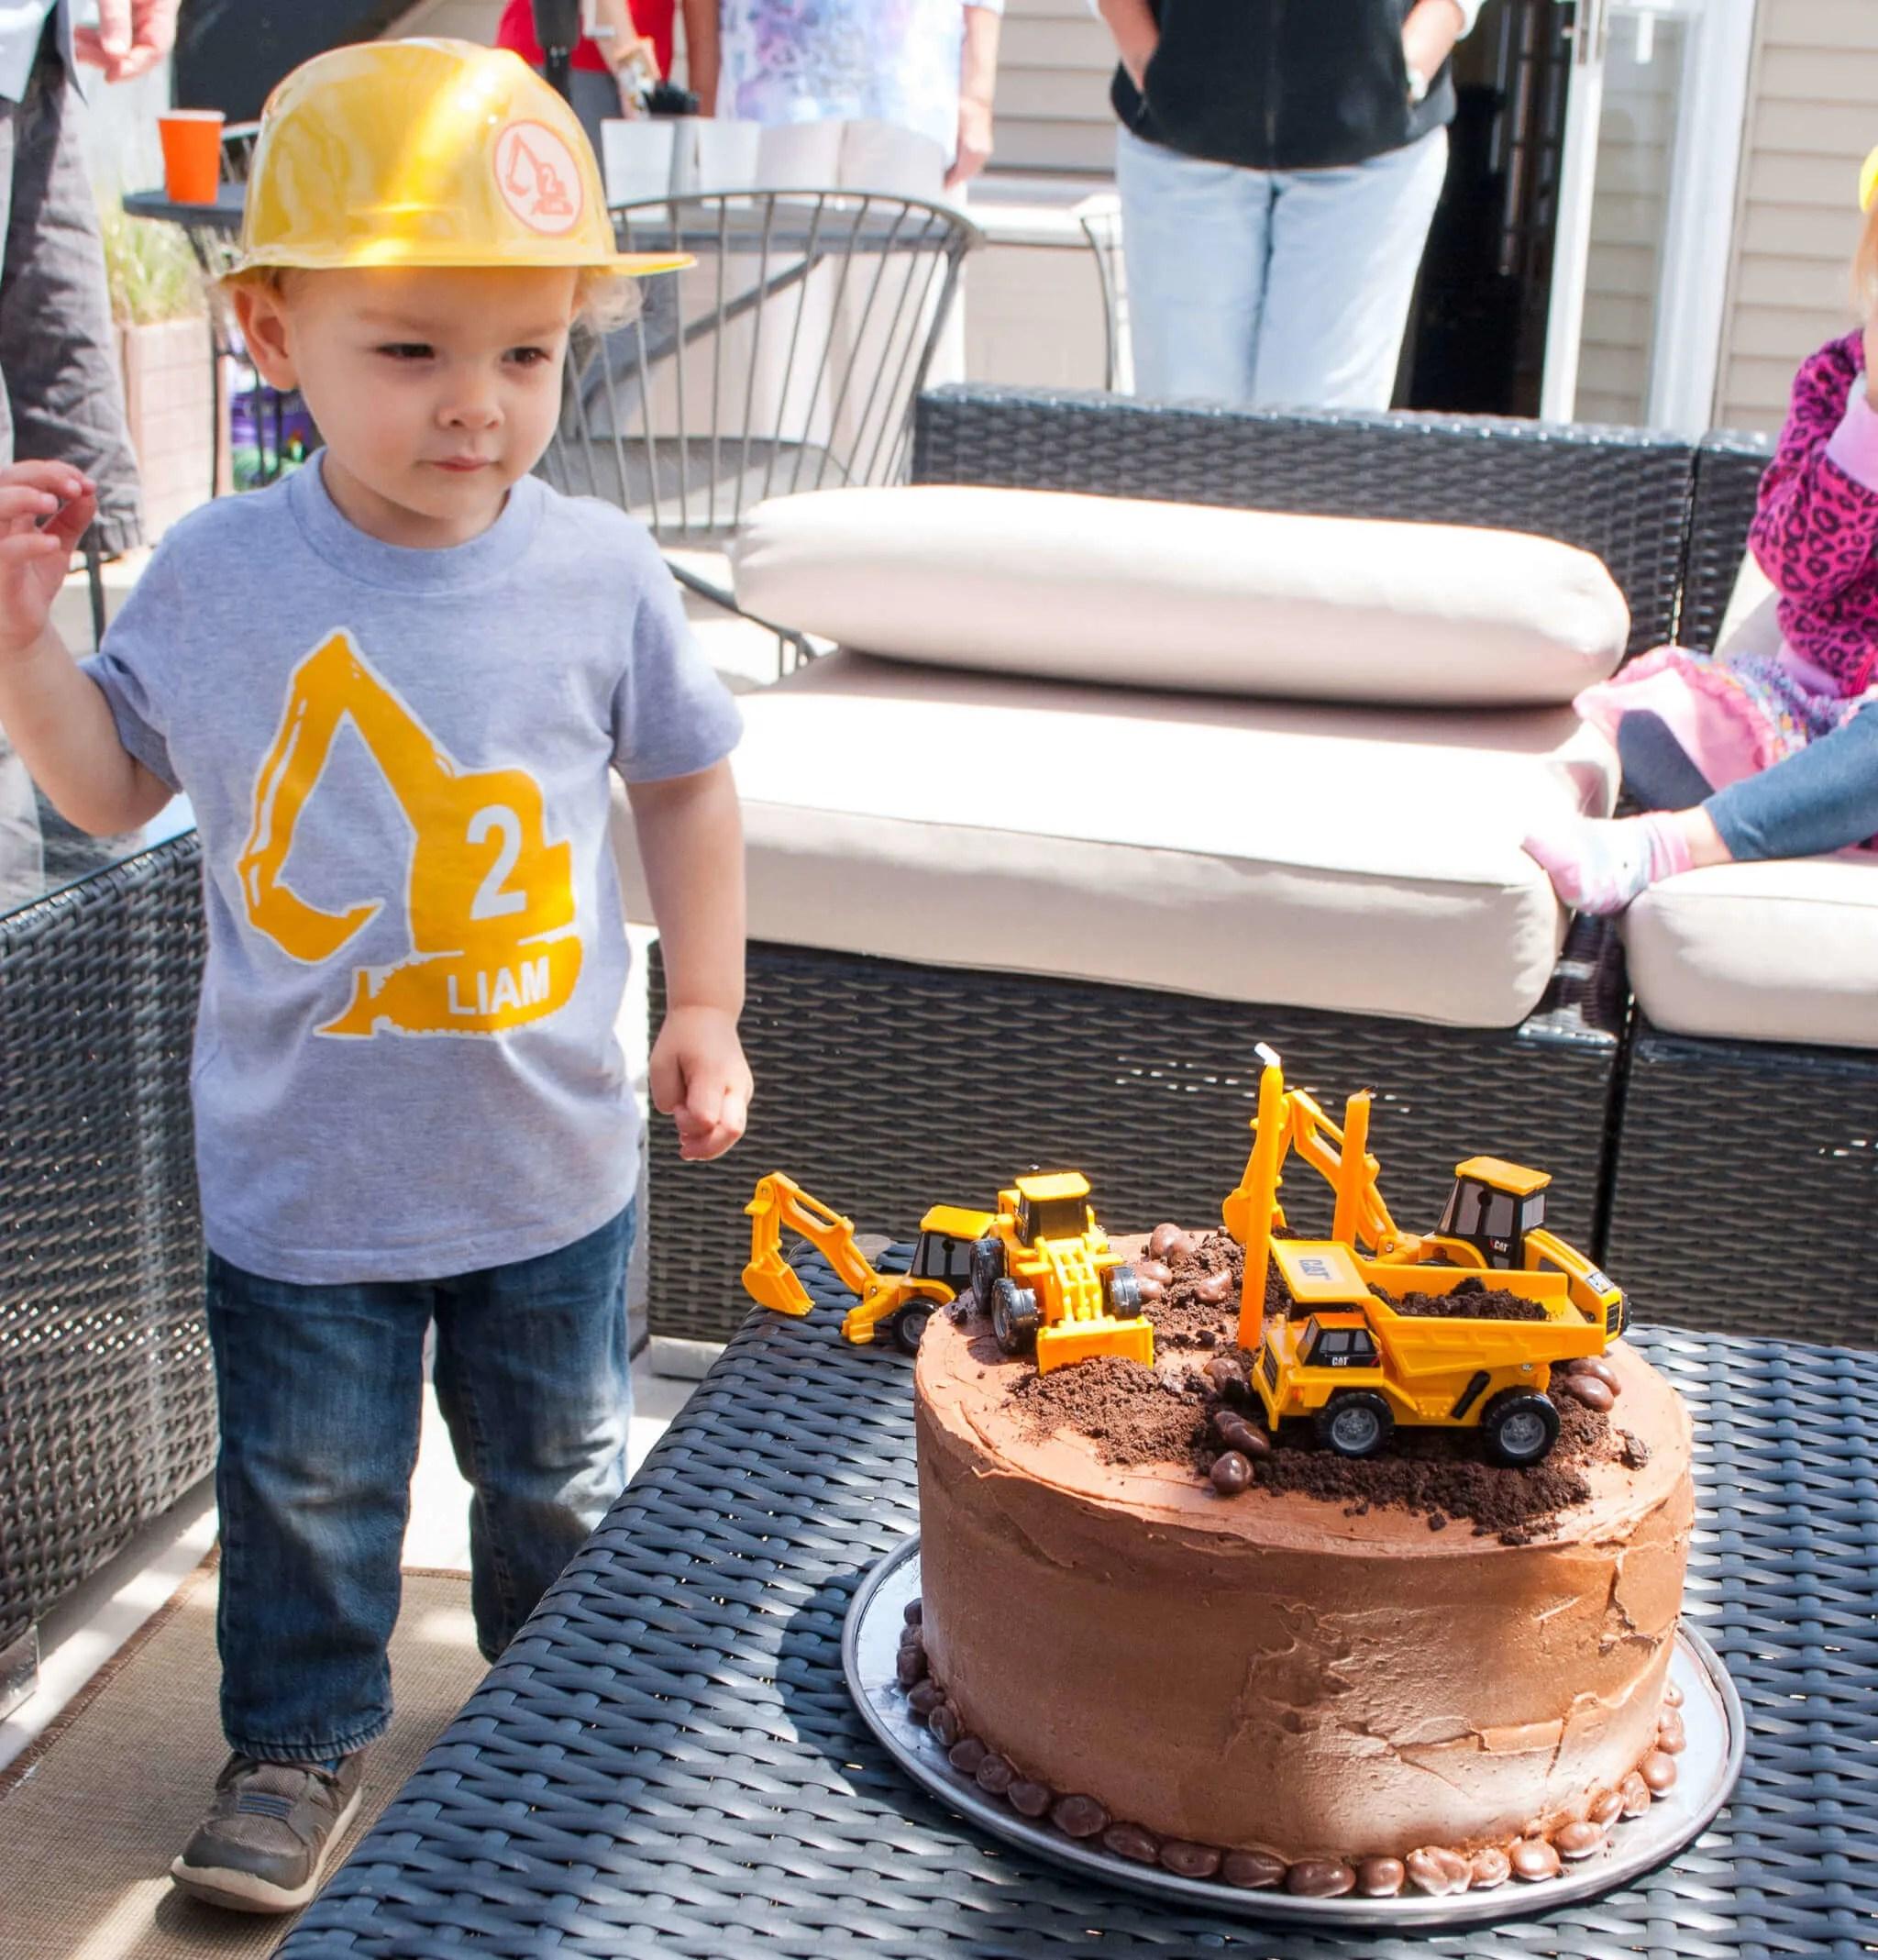 Construction Birthday Party Ideas Modern Decorations Supplies Invitations Favors Cake Merriment Design